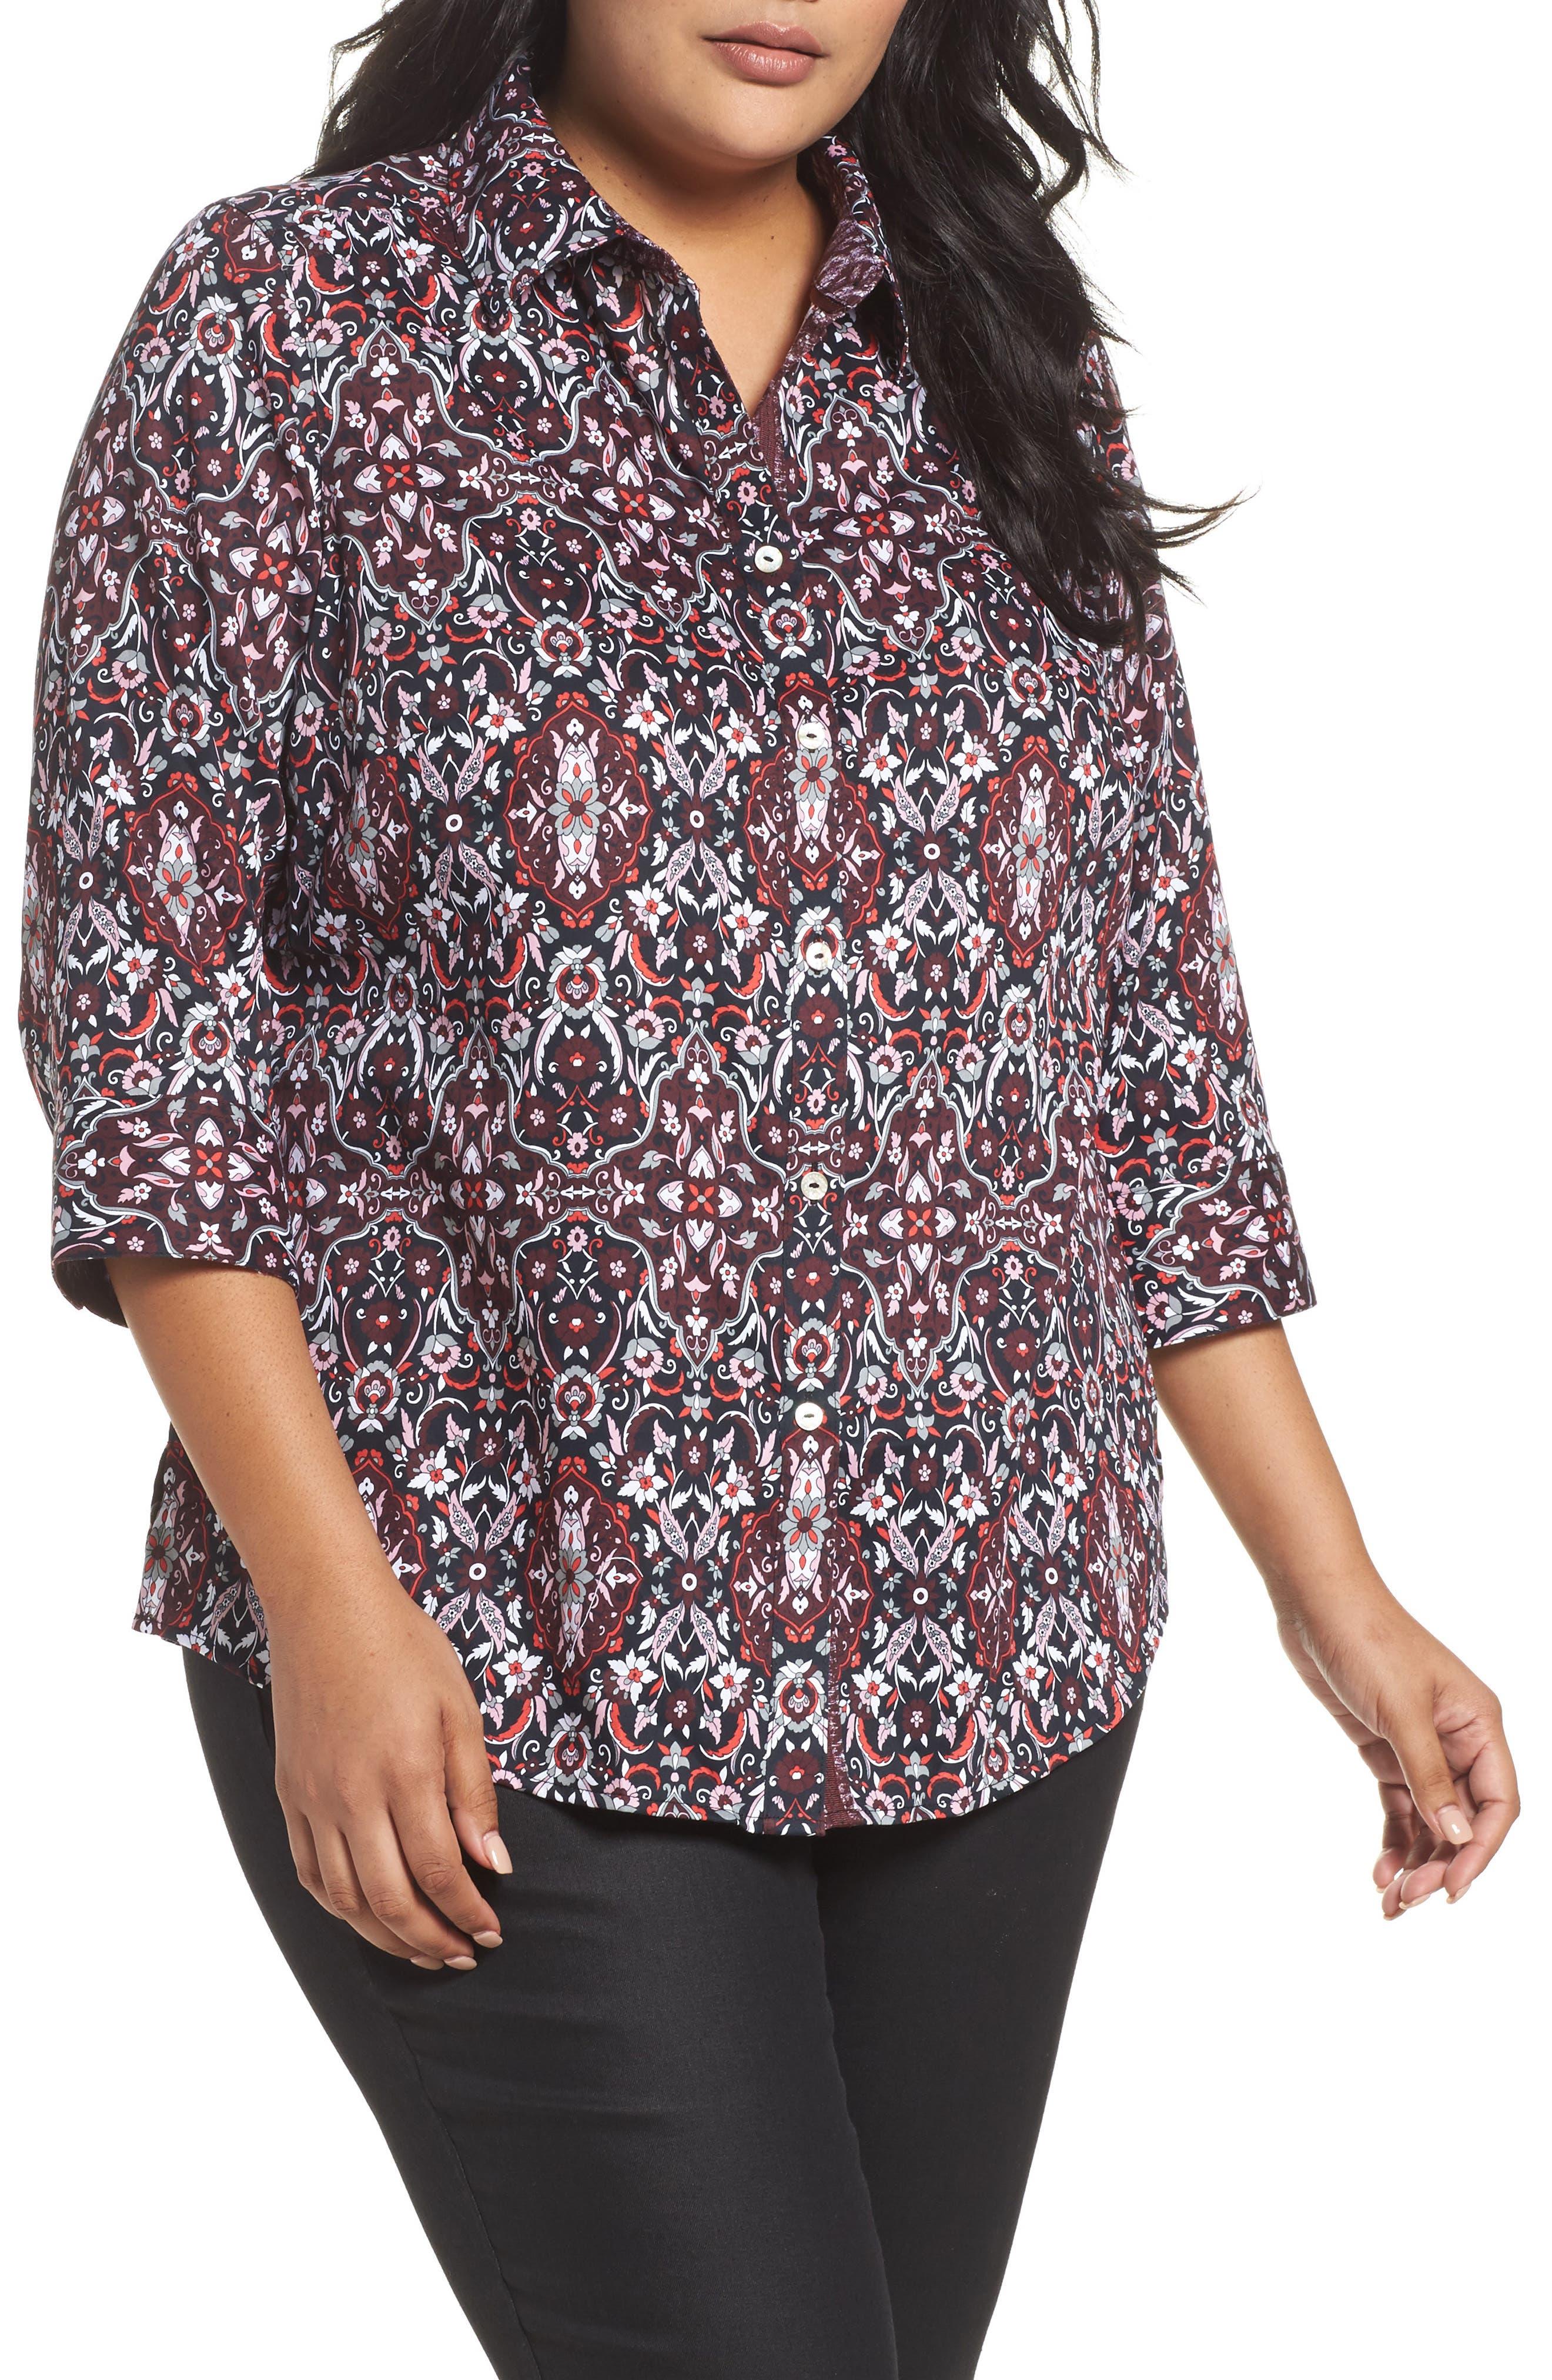 Ava Heirloom Paisley Print Cotton Shirt,                         Main,                         color, Multi